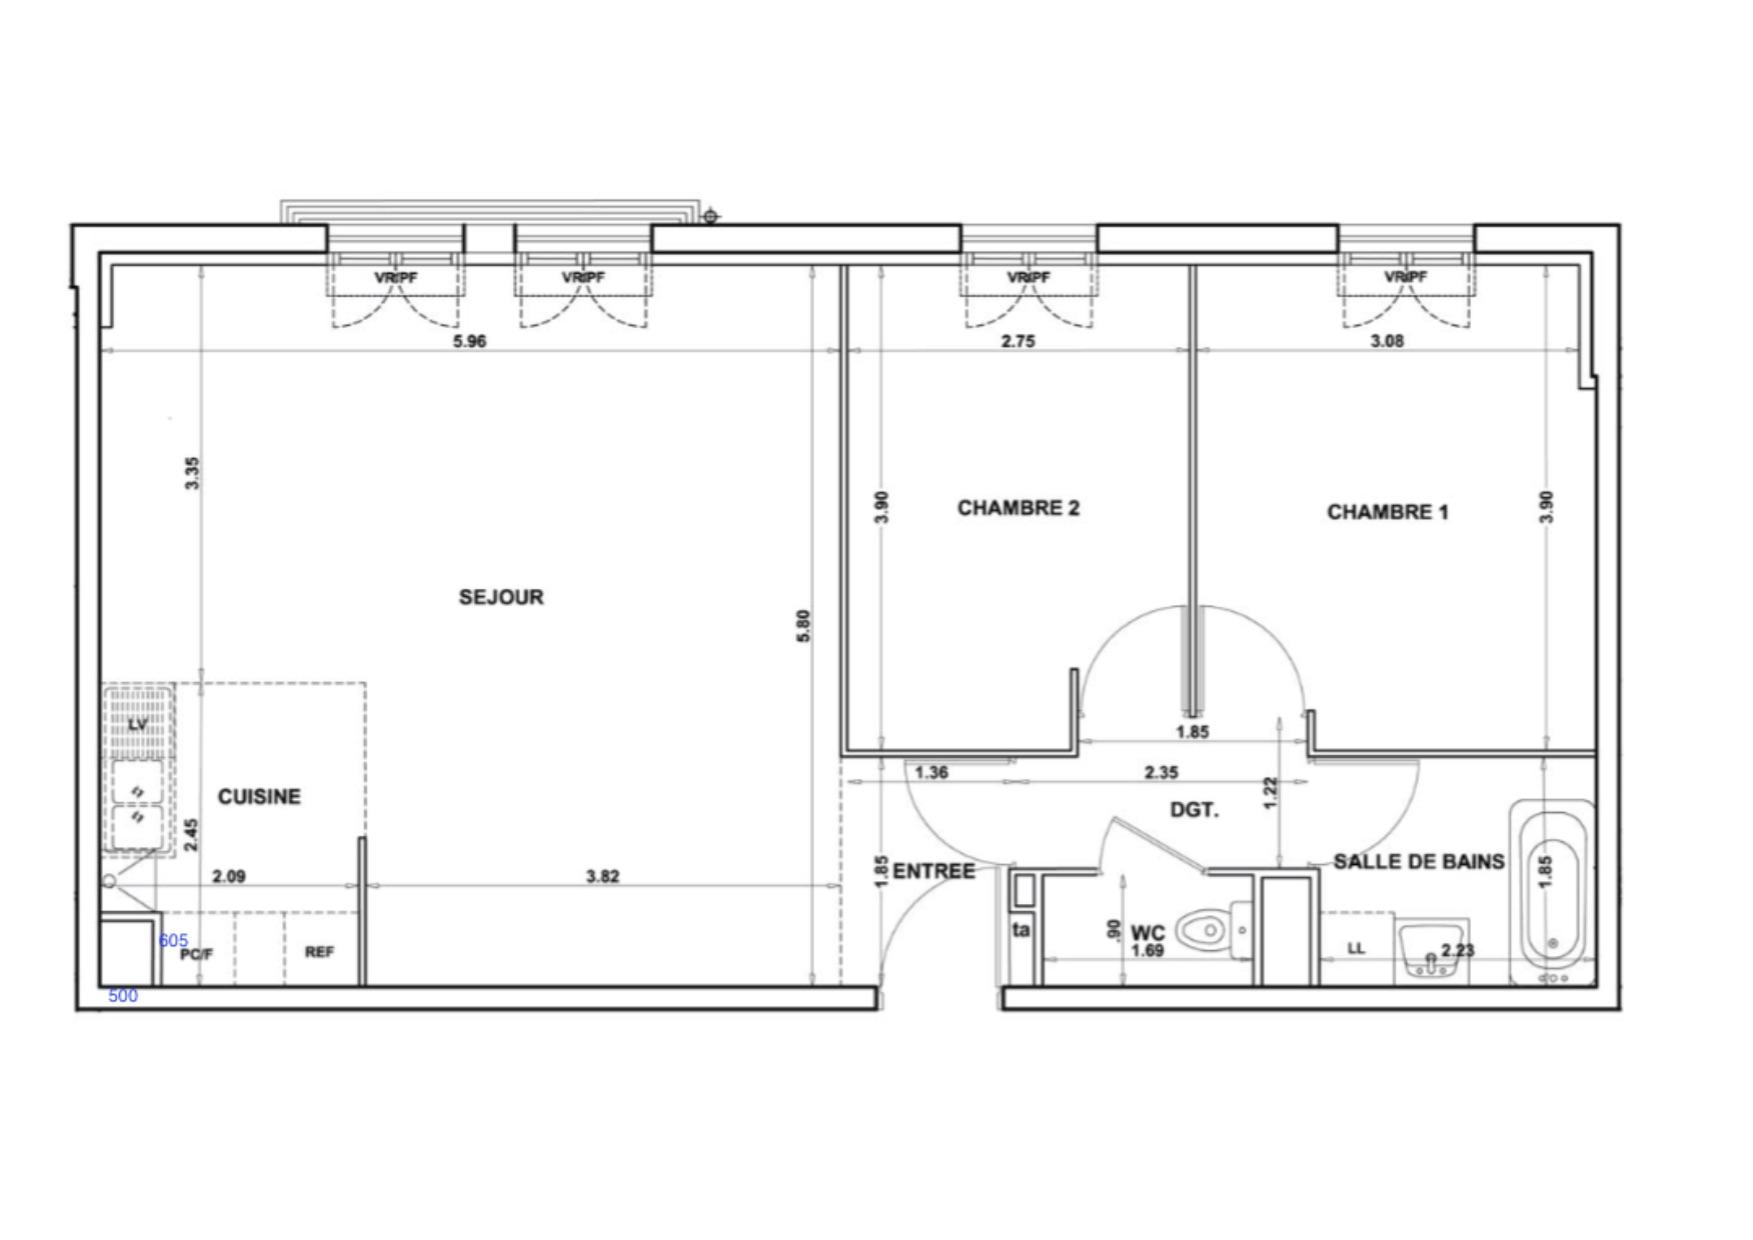 valorisation immobili re d 39 un appartement t moin limay synergie d co. Black Bedroom Furniture Sets. Home Design Ideas